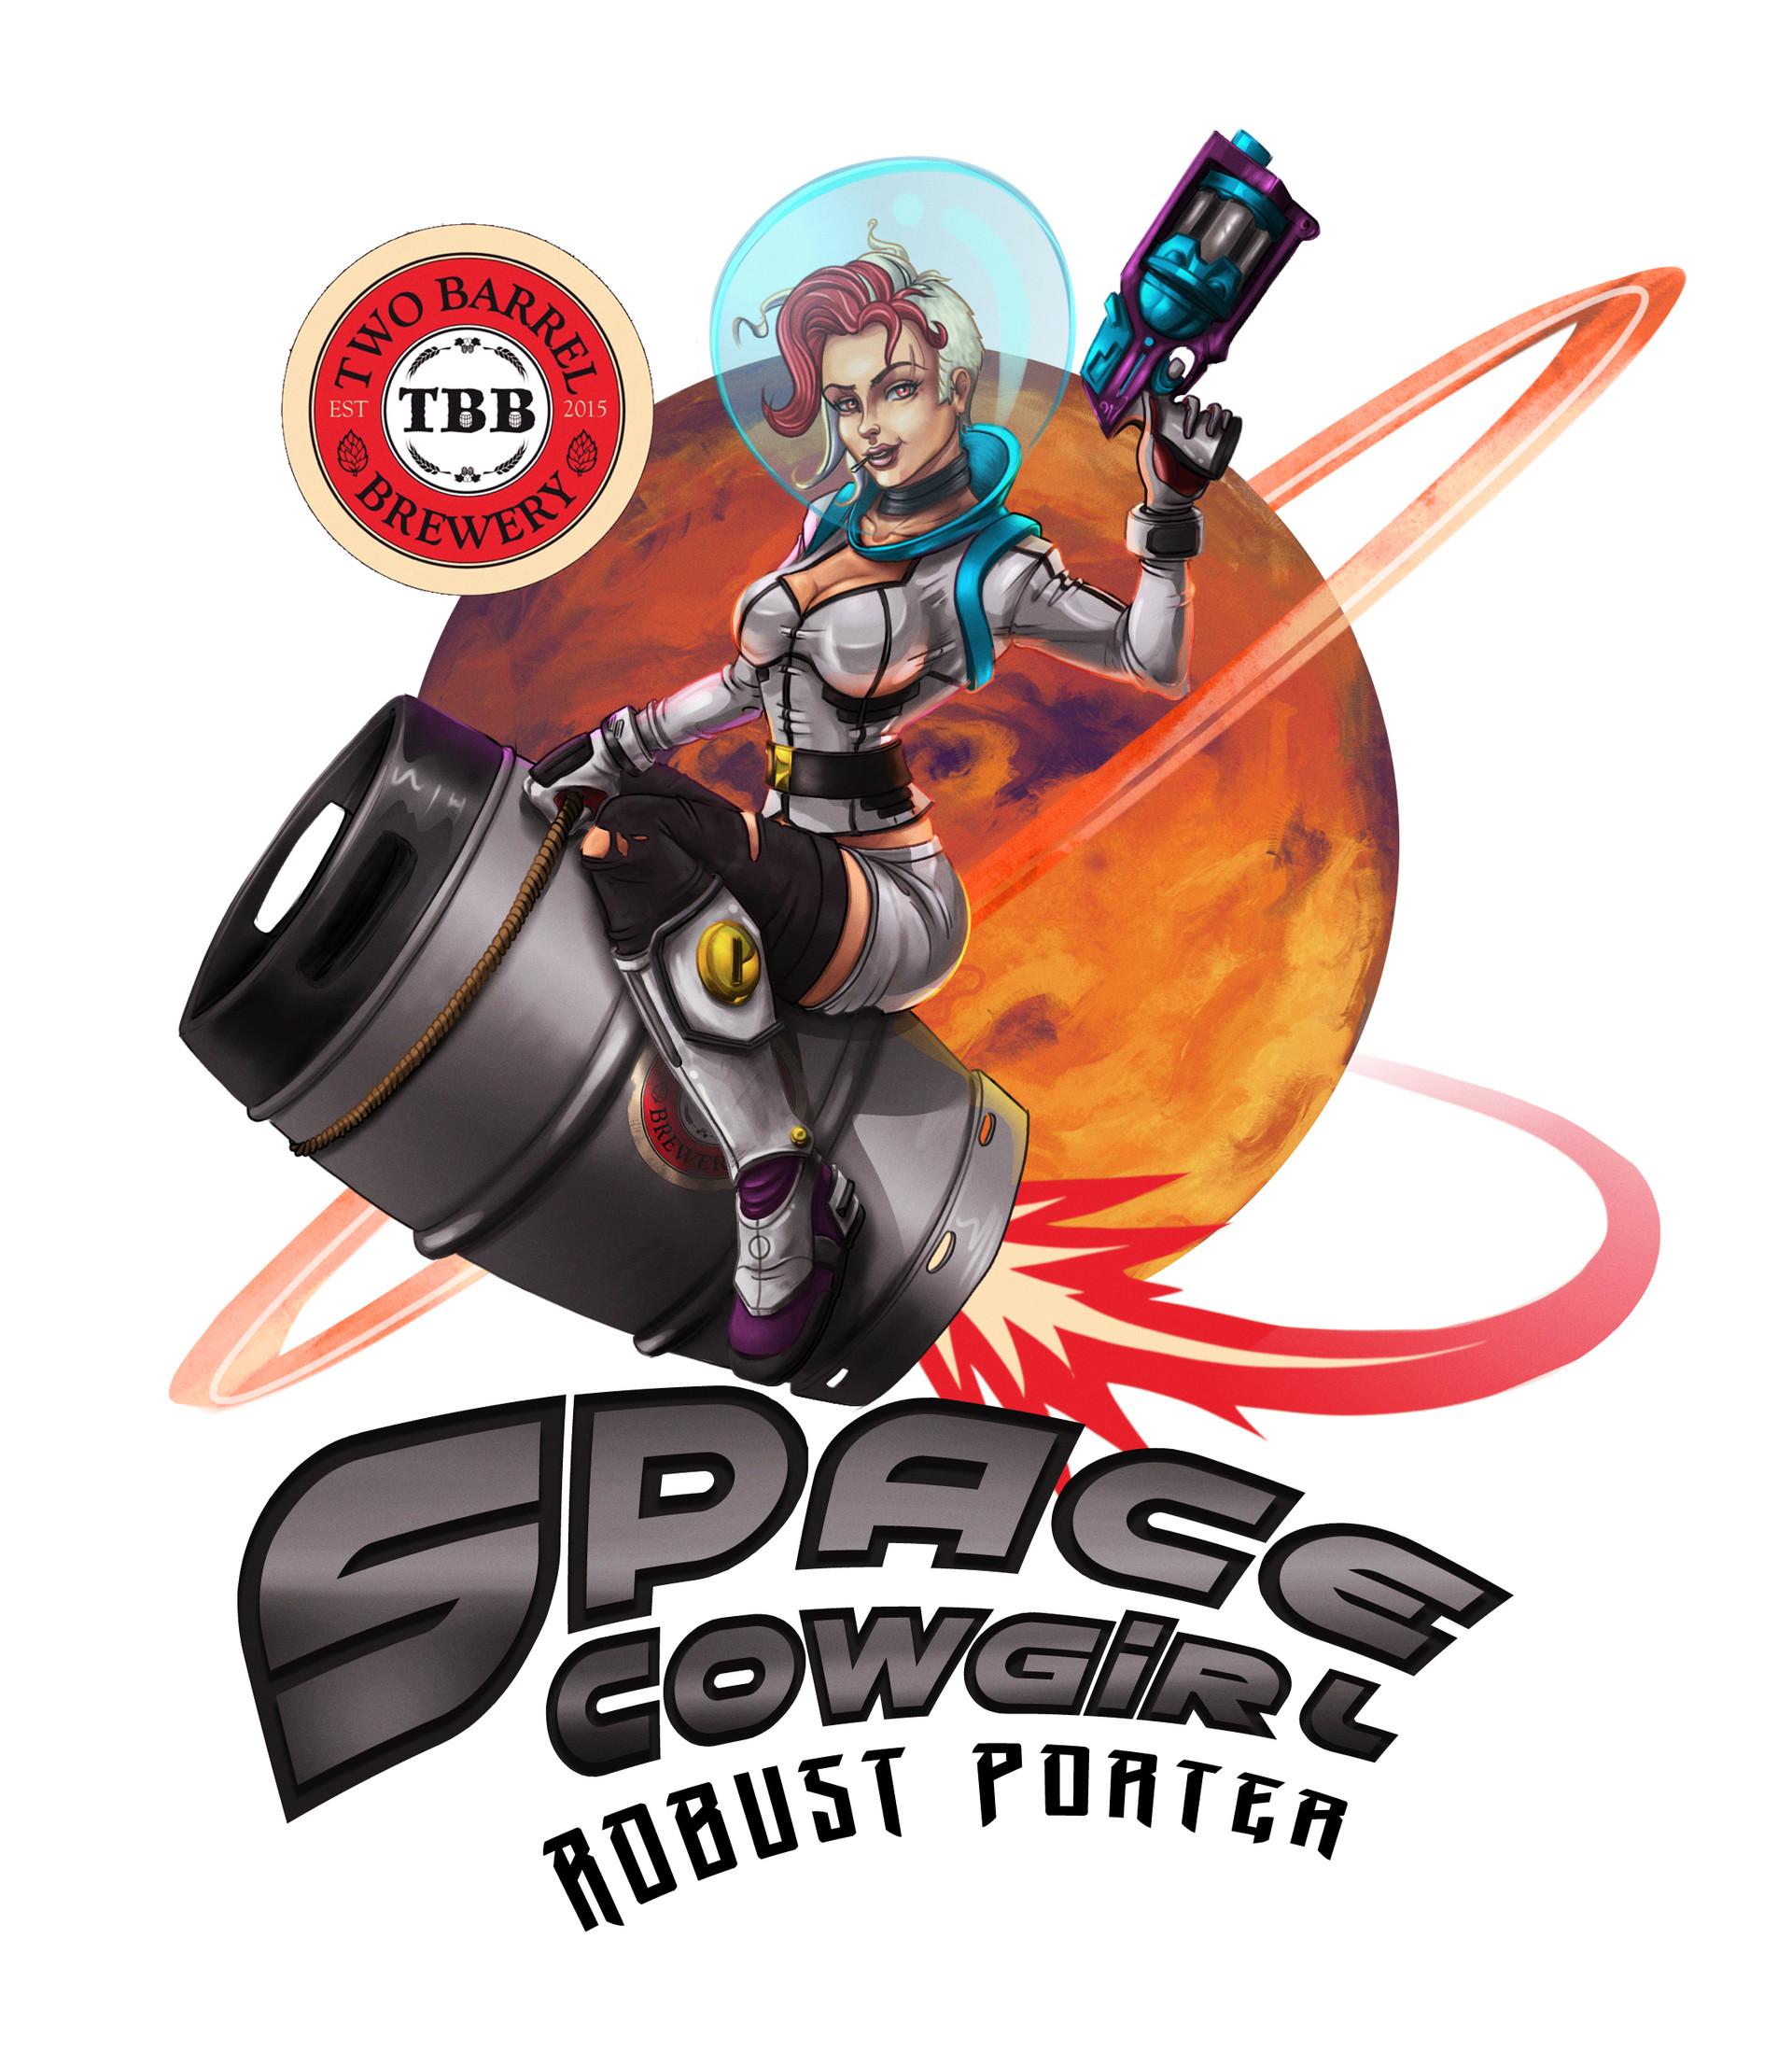 Daniel reyes spacegirlblancafinal